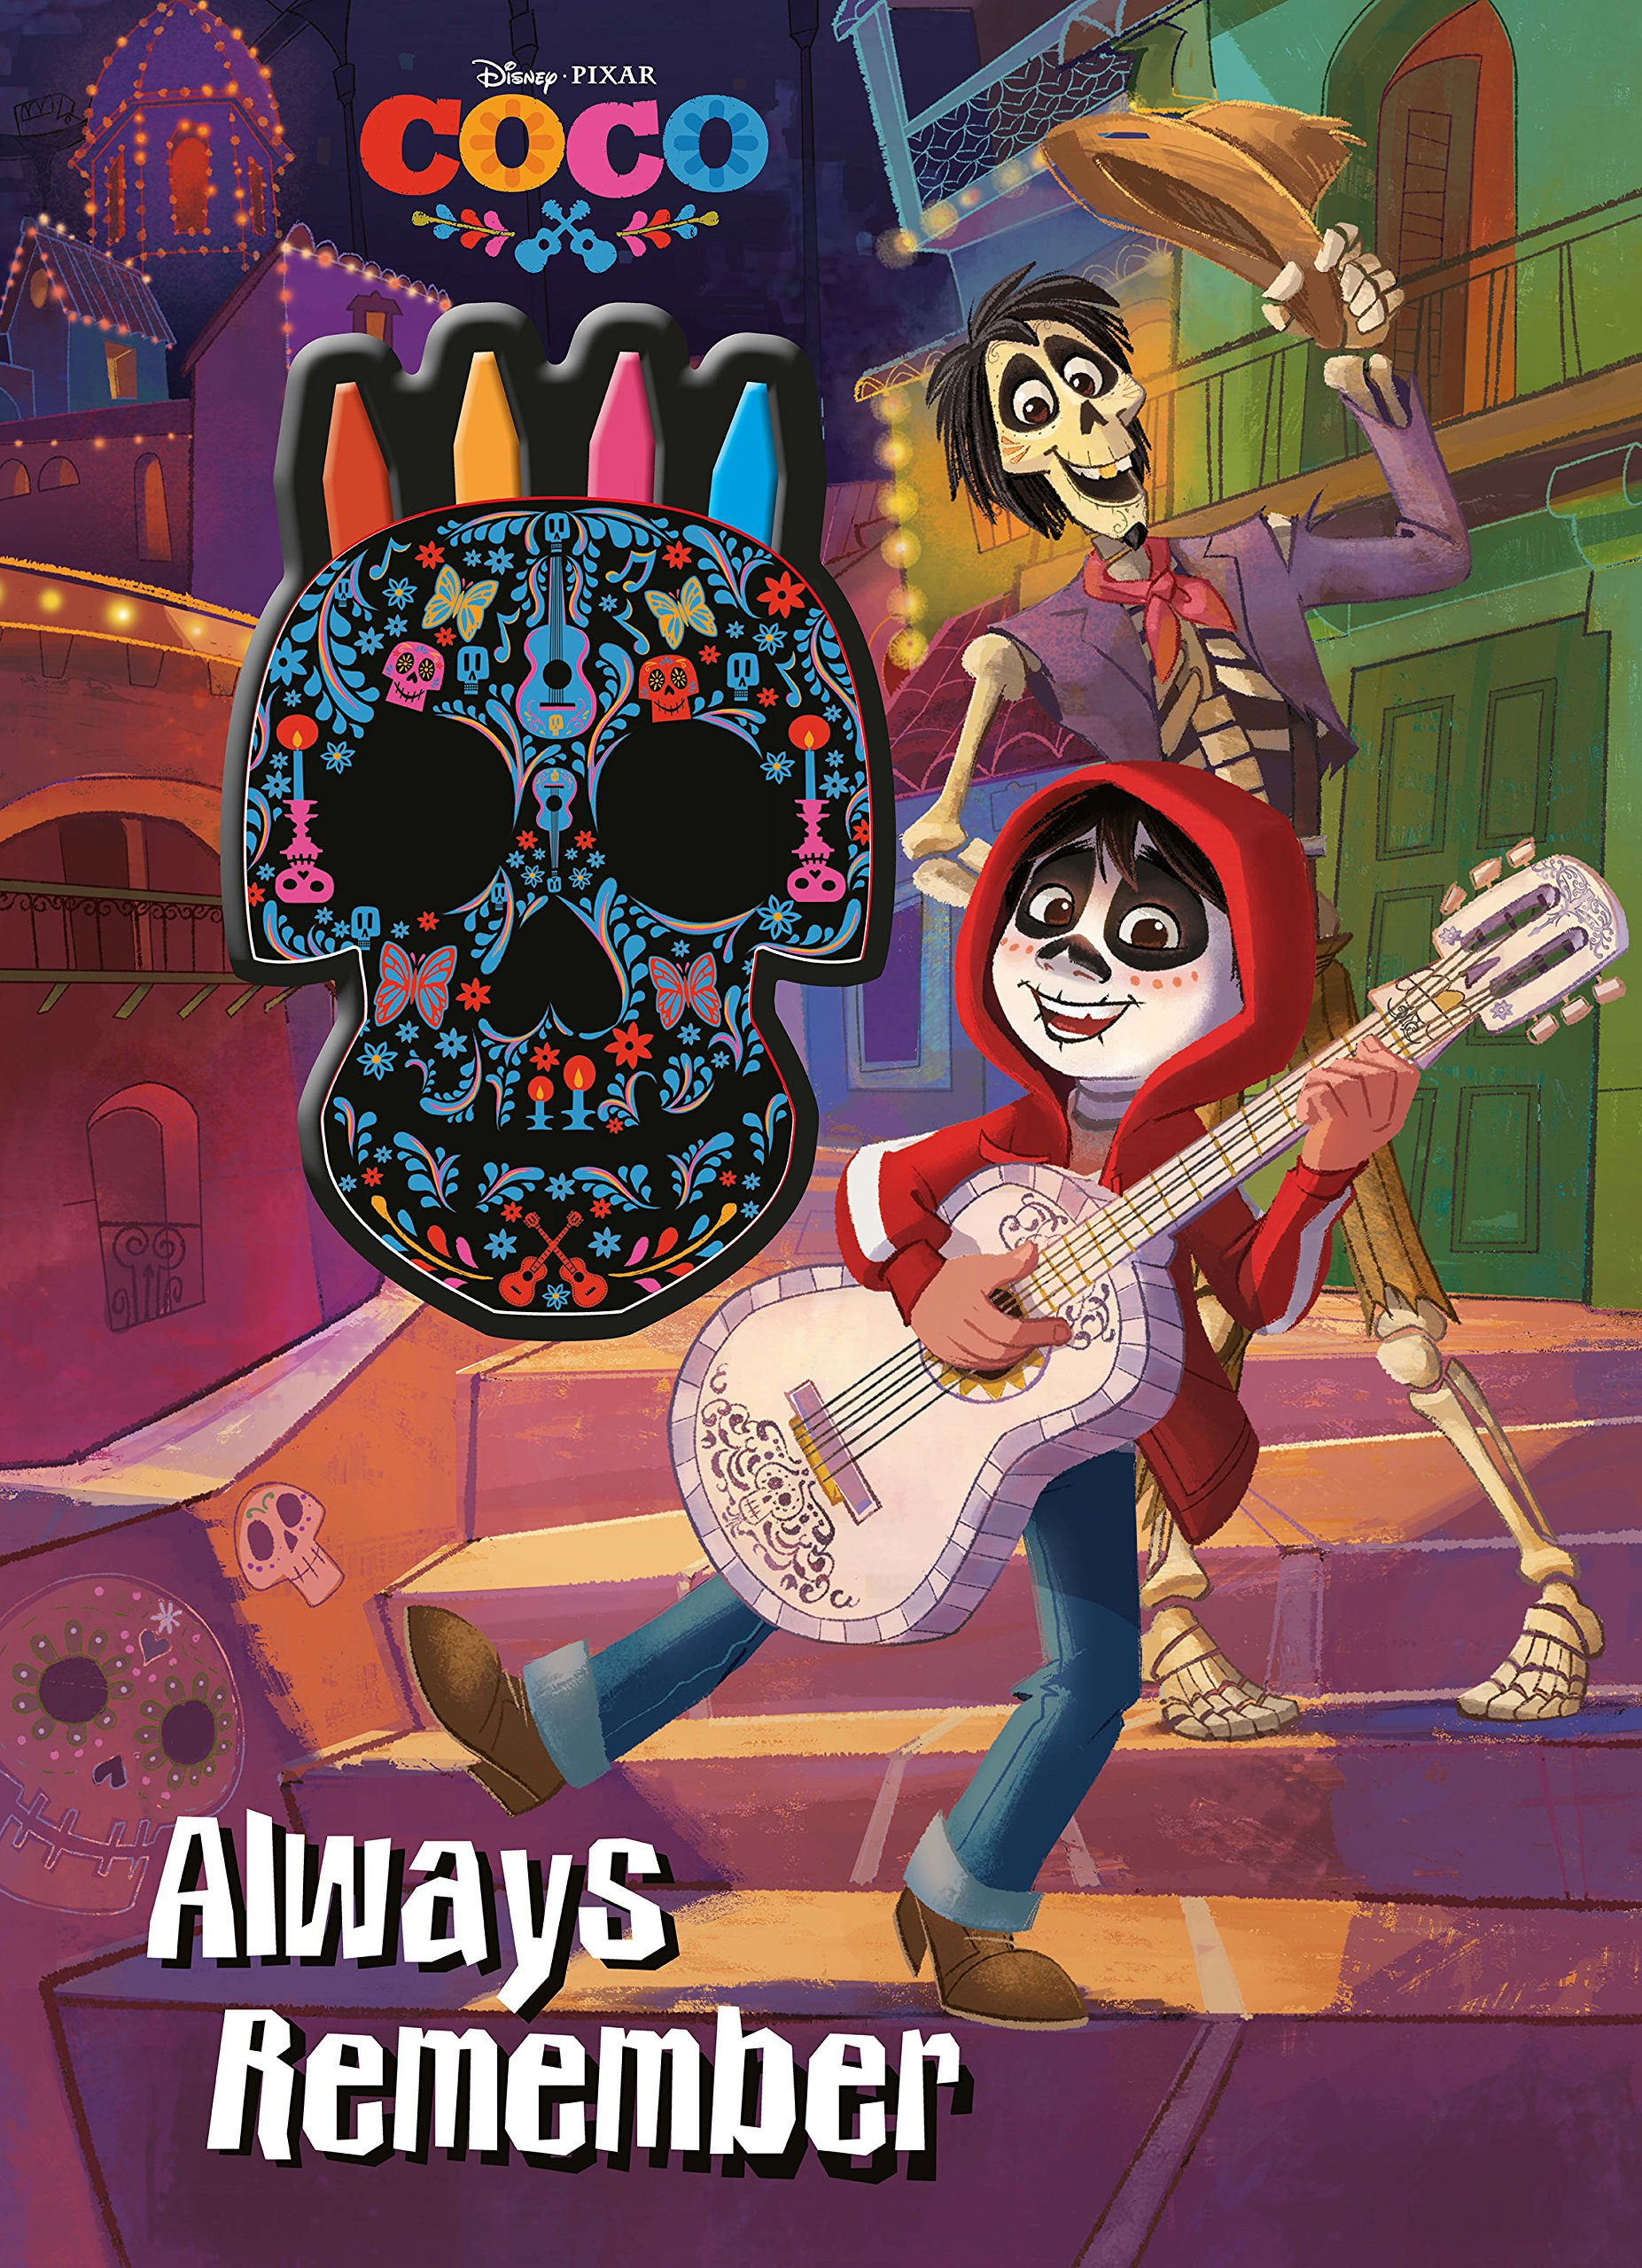 Critique du livre Disney Pixar